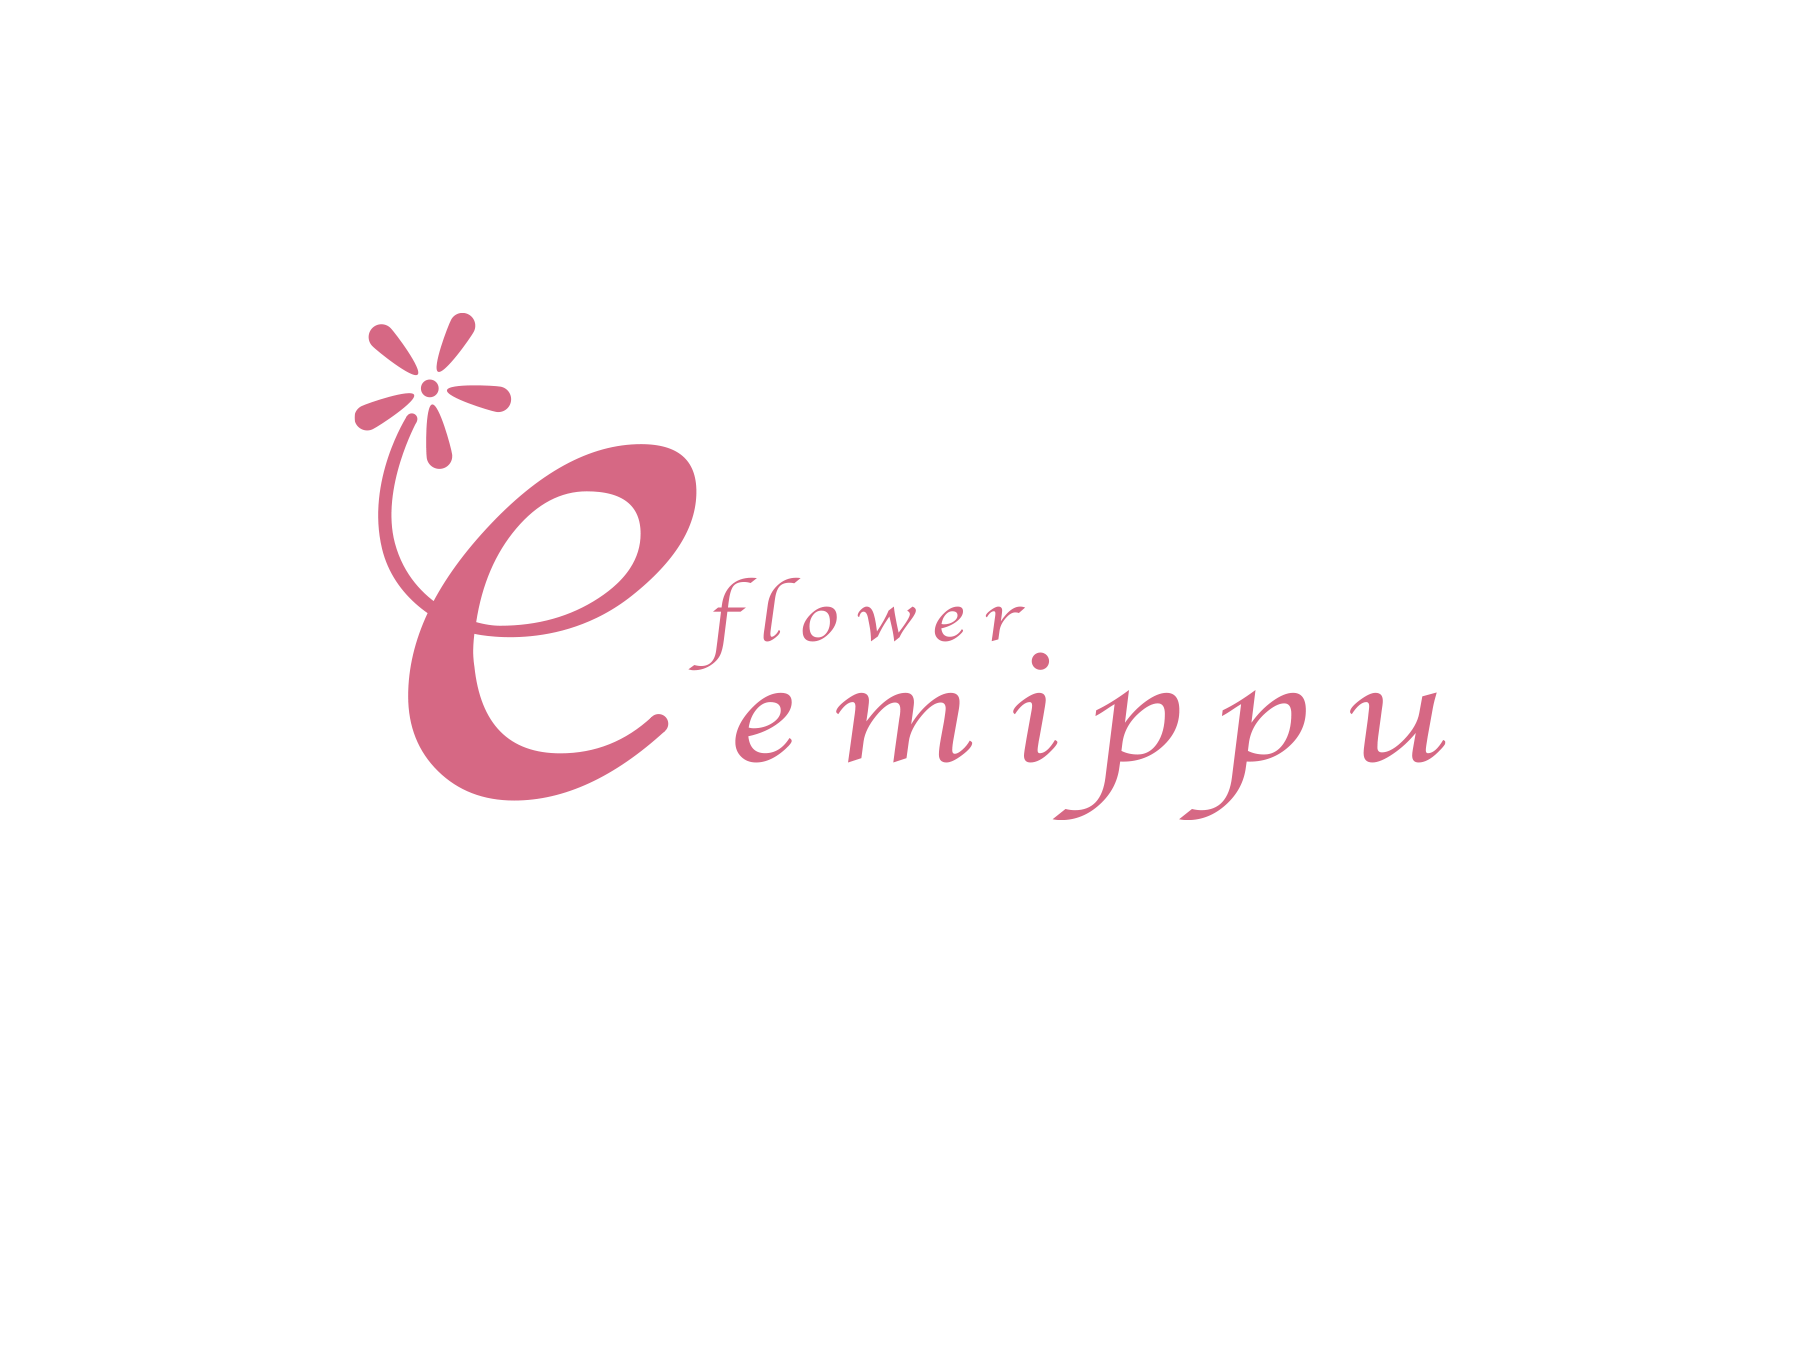 fower emippu ginza ロゴマーク